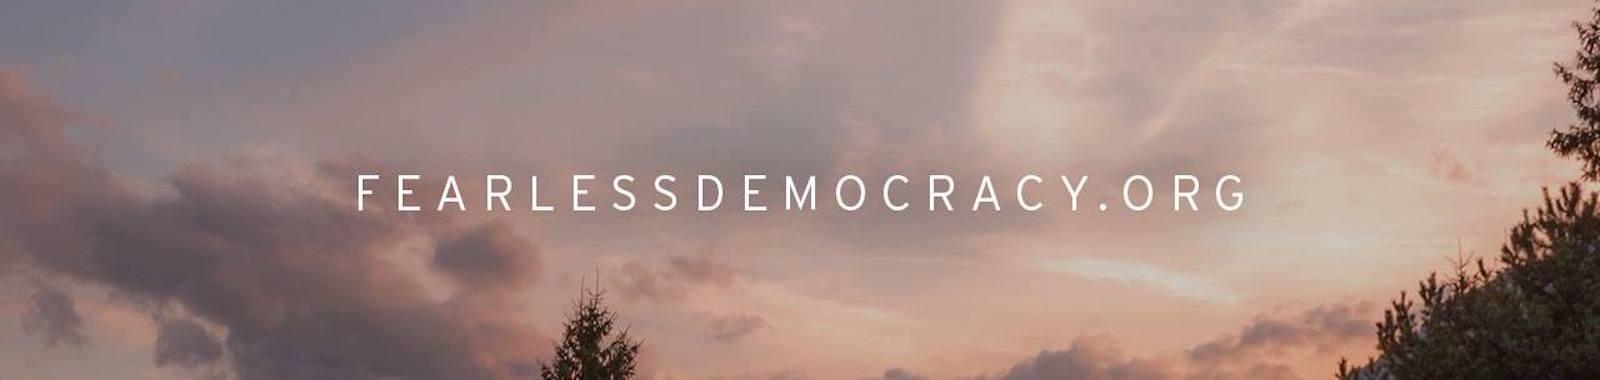 fearlessdemocracy_eye